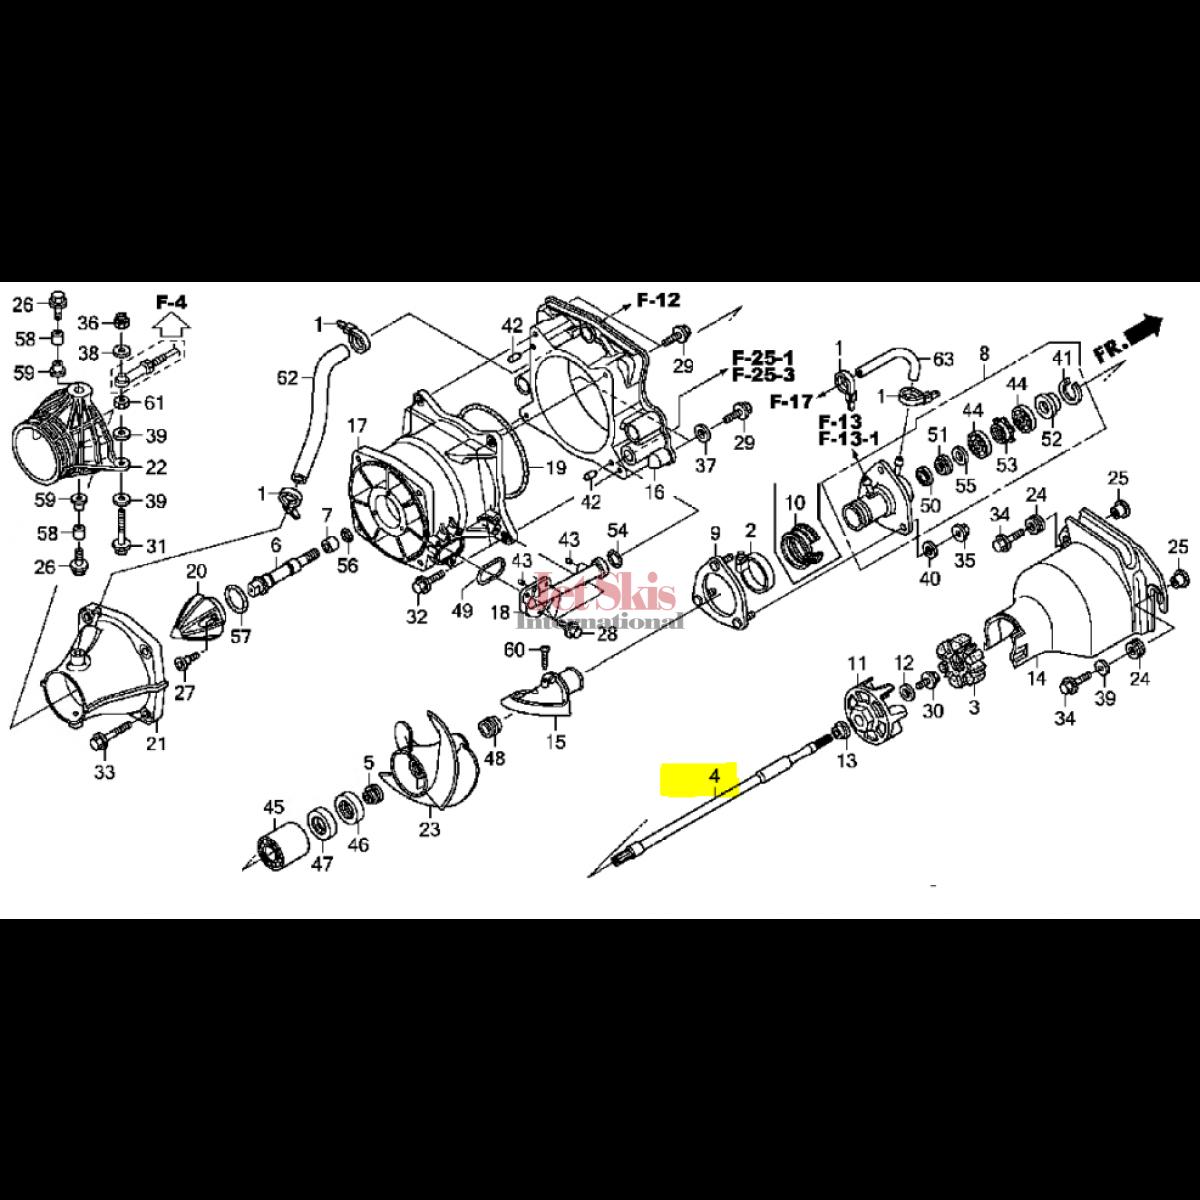 Sea Doo 4 Tech Engine Parts Wiring Diagram And Fuse Box F 12x 2005 As Well Kawasaki Piston Ring Set 12f Stx 12 13001 3736